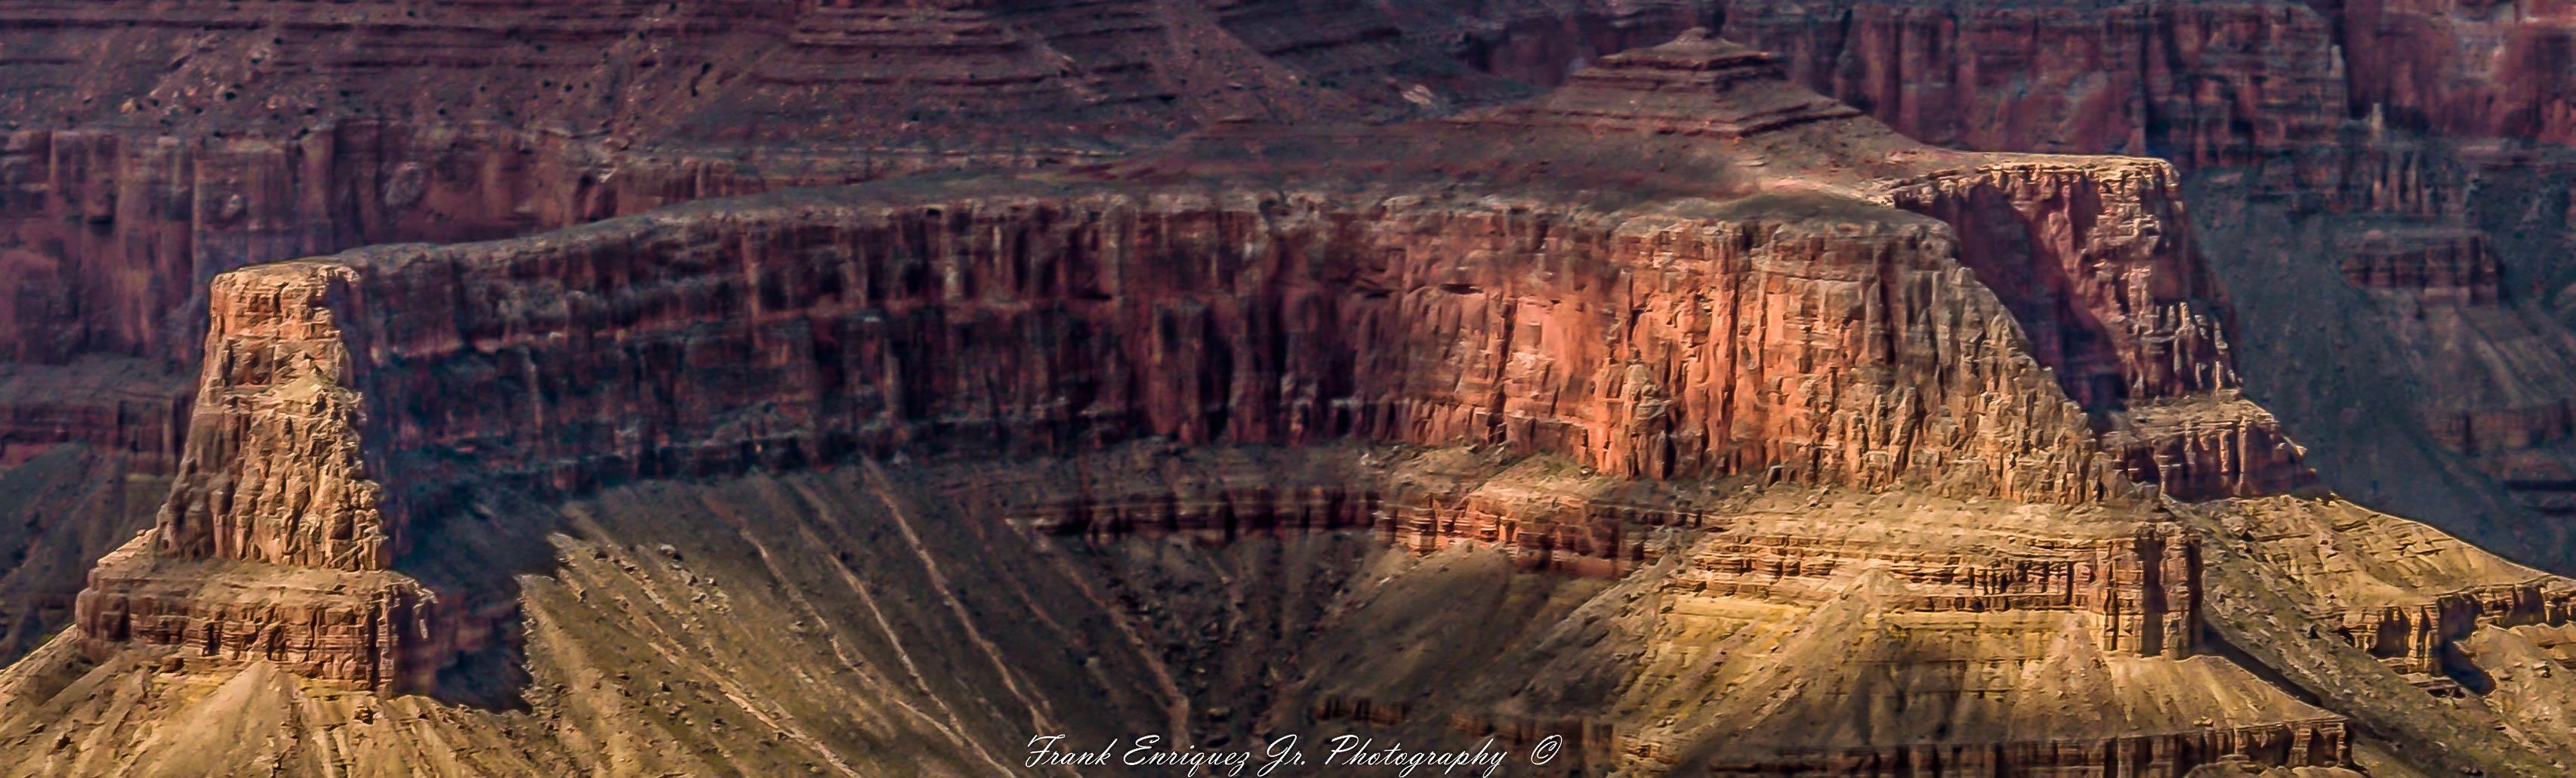 Photo by Frank Enriquez Jr.     Grand Canyon